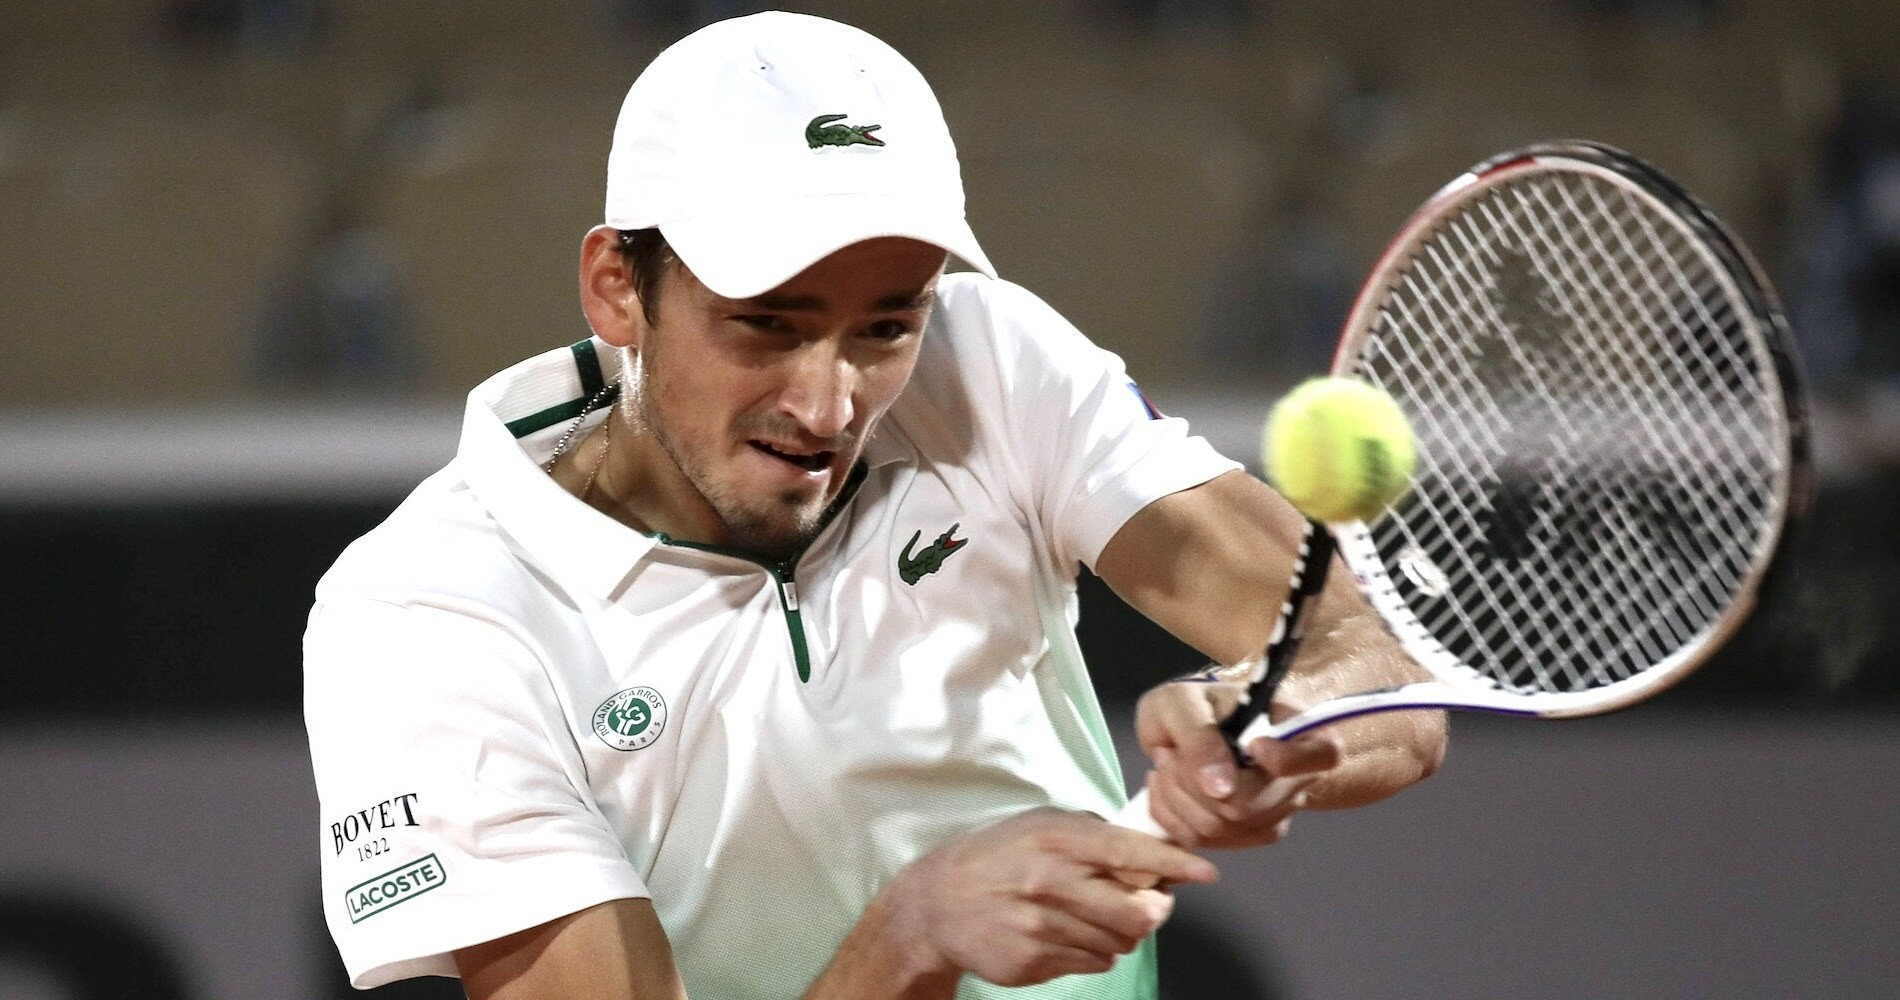 Medvedev Roland Garros 2020